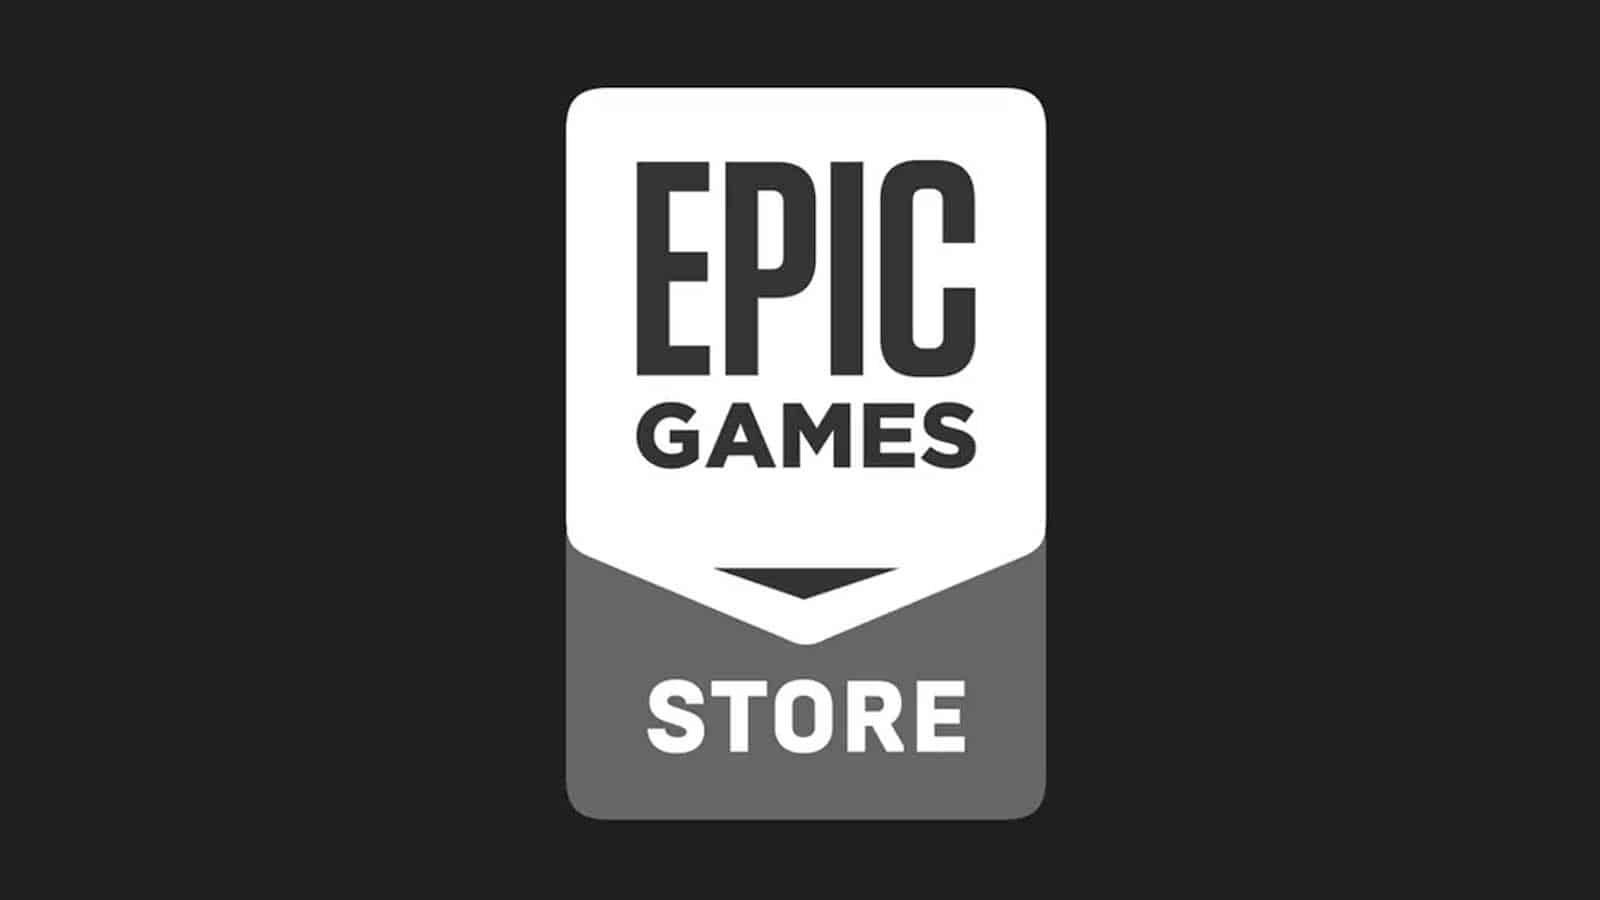 epic games store 100 million